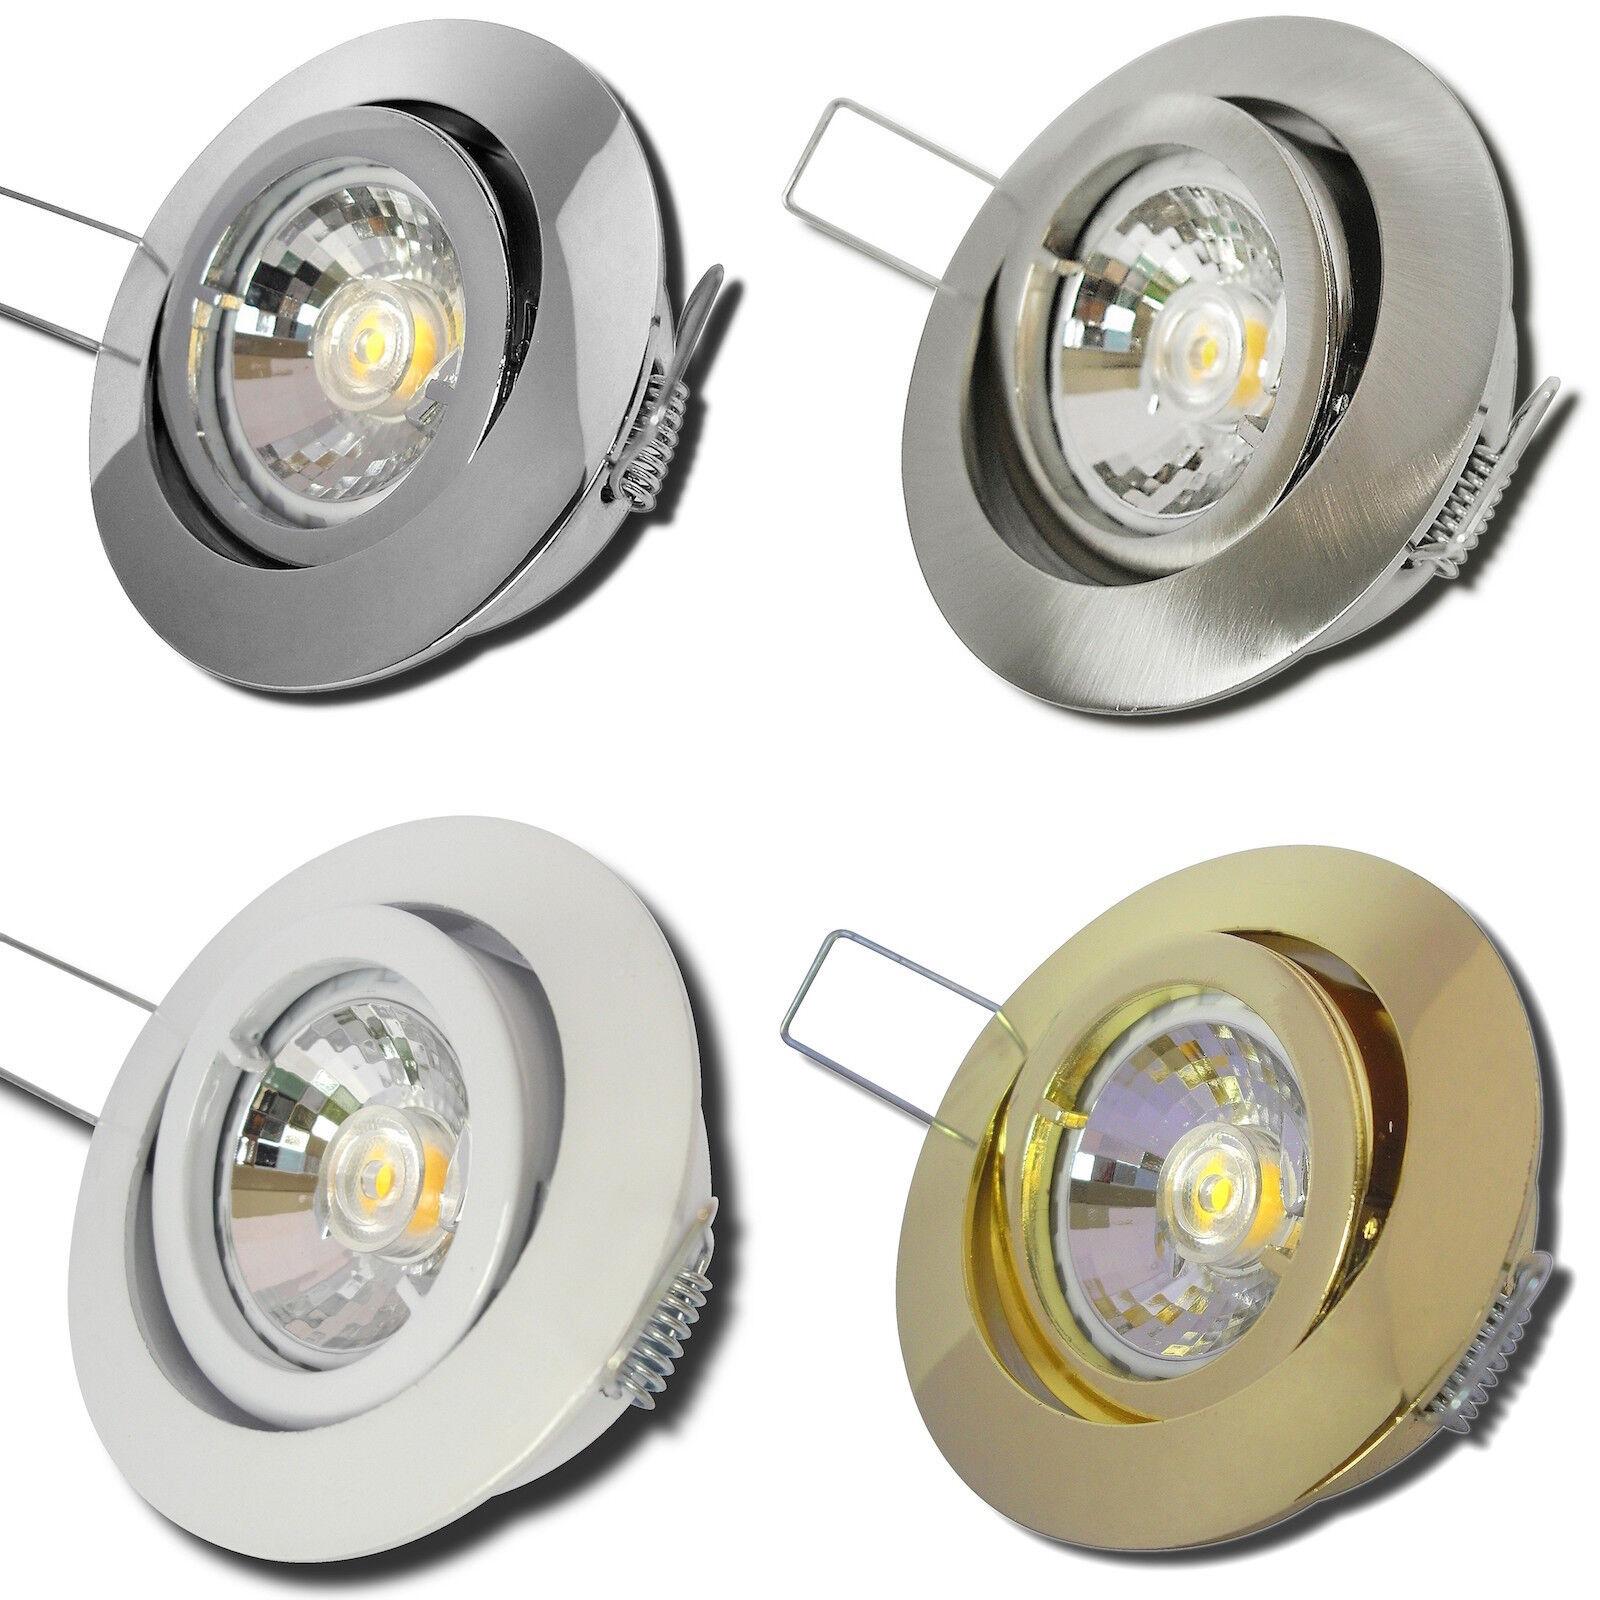 Sets- LED Einbaustrahler Timo 230Volt Einbauspots 3W=35W Spots - Deckenstrahler